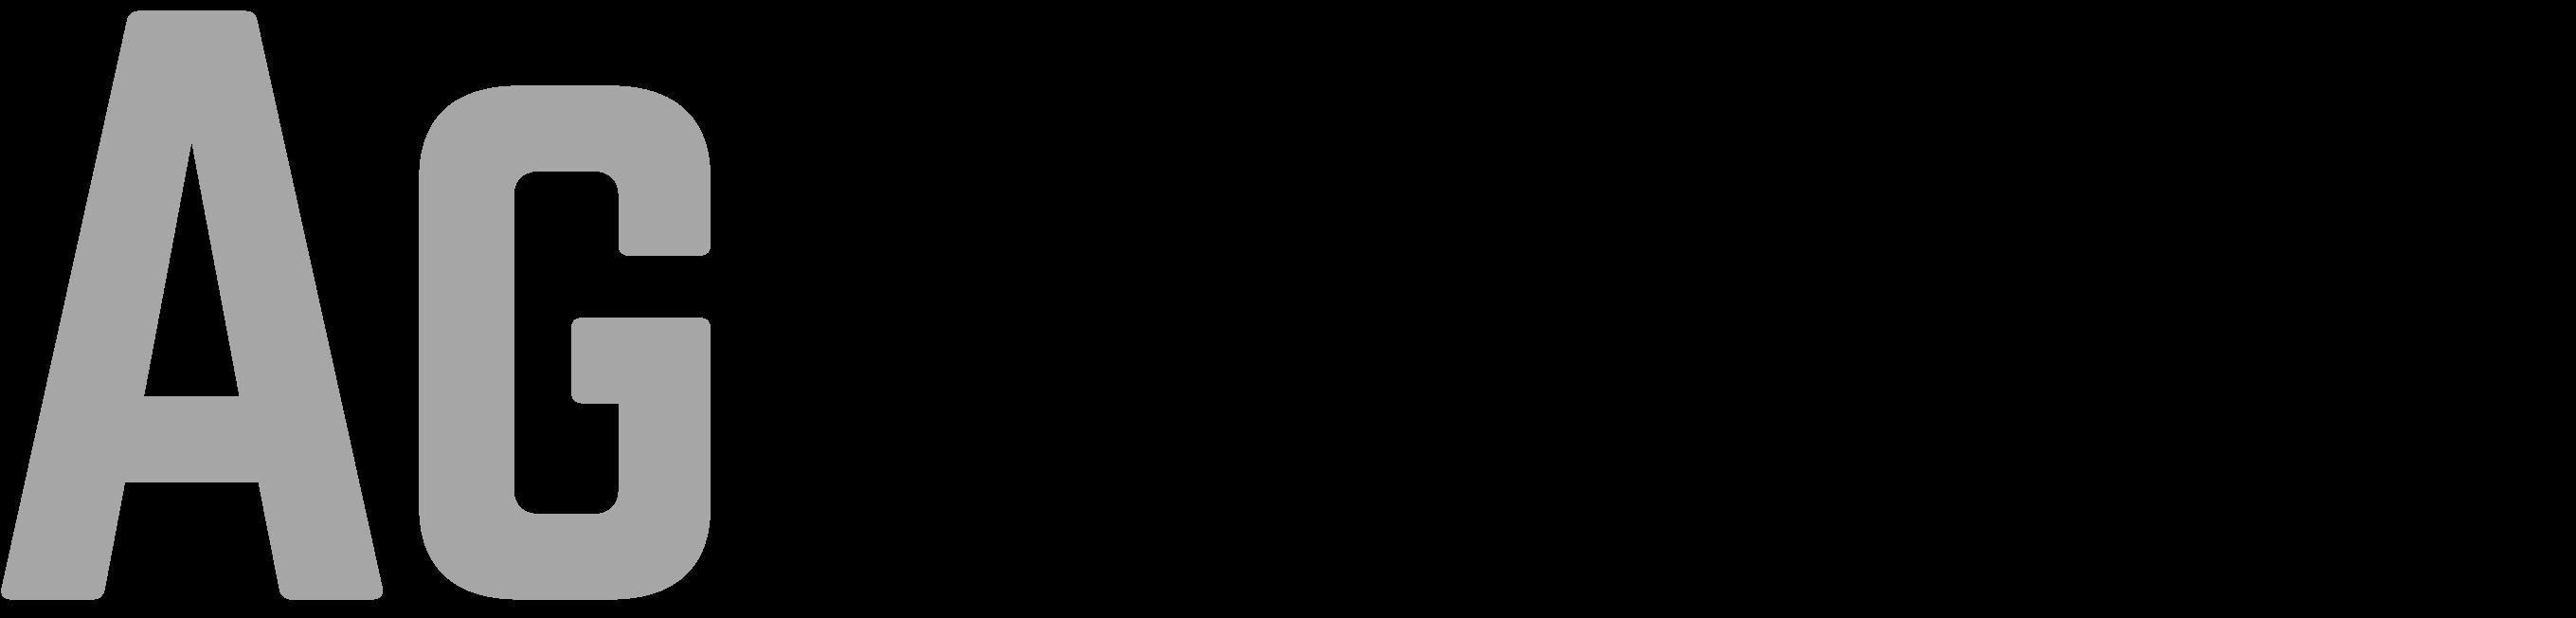 AgSmart Ceylon (Pvt) Limited